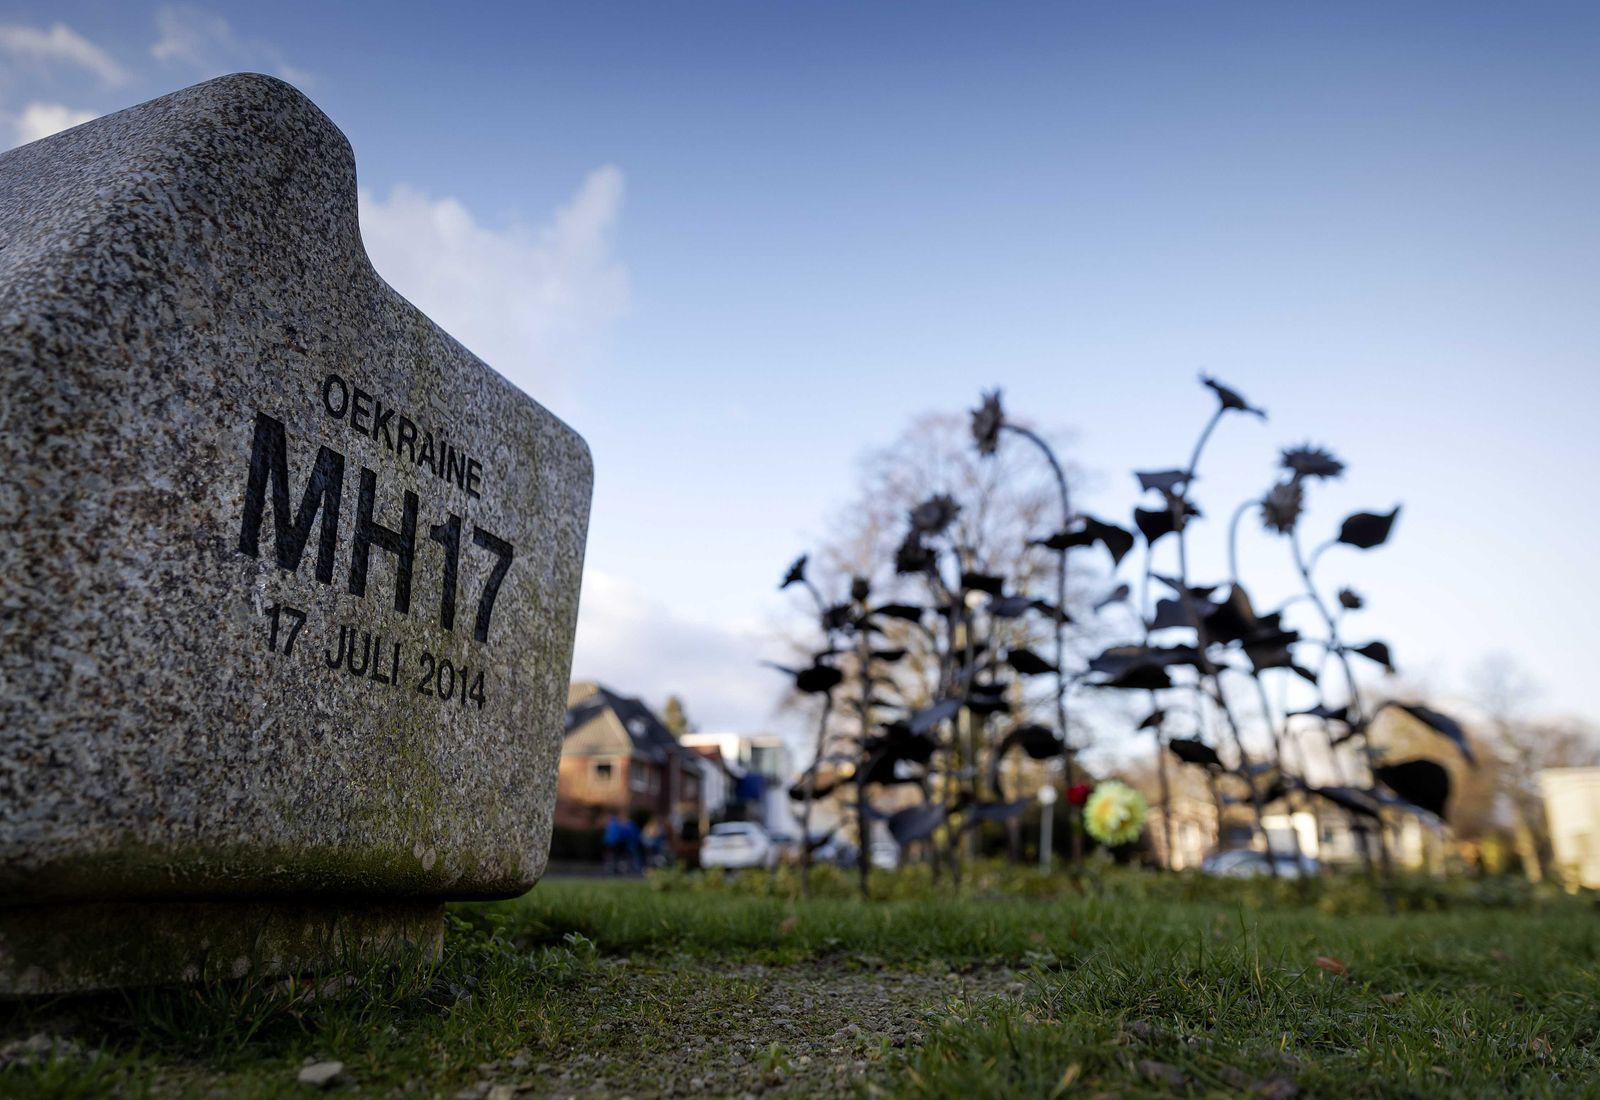 Before MH17 trial, Hilversum, Netherlands - 12 Feb 2020